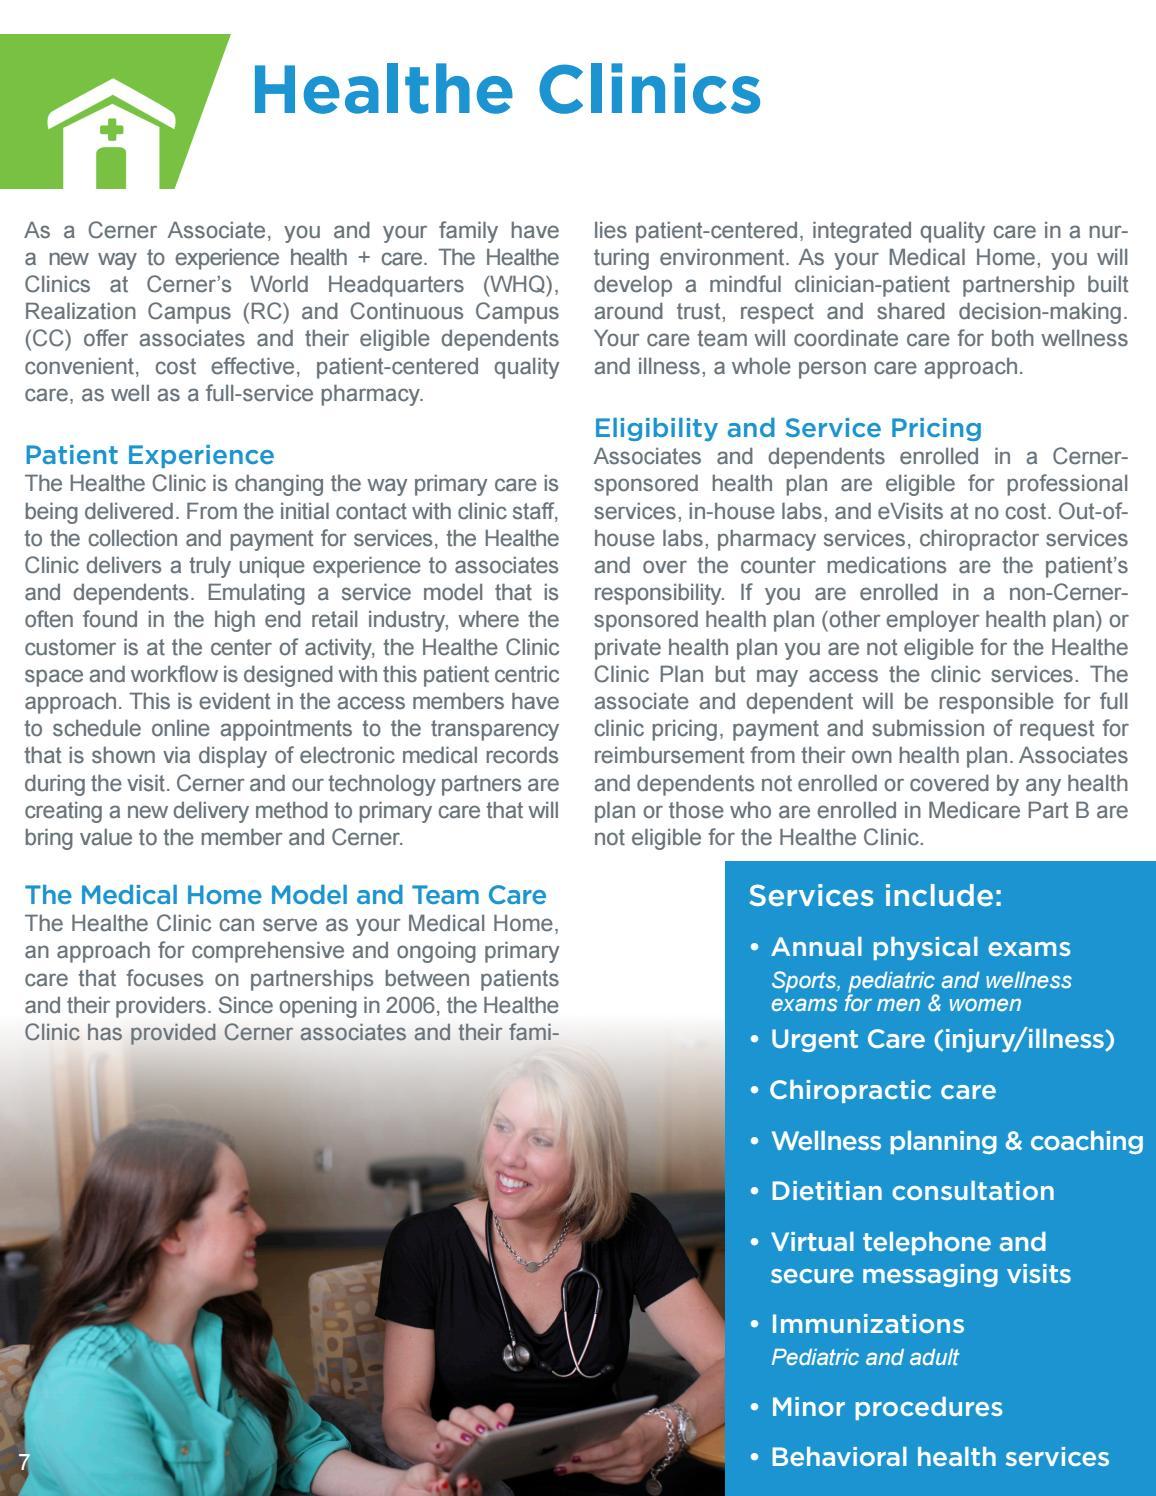 2017 united states cerner benefits brochure by cernercorporation issuu altavistaventures Image collections